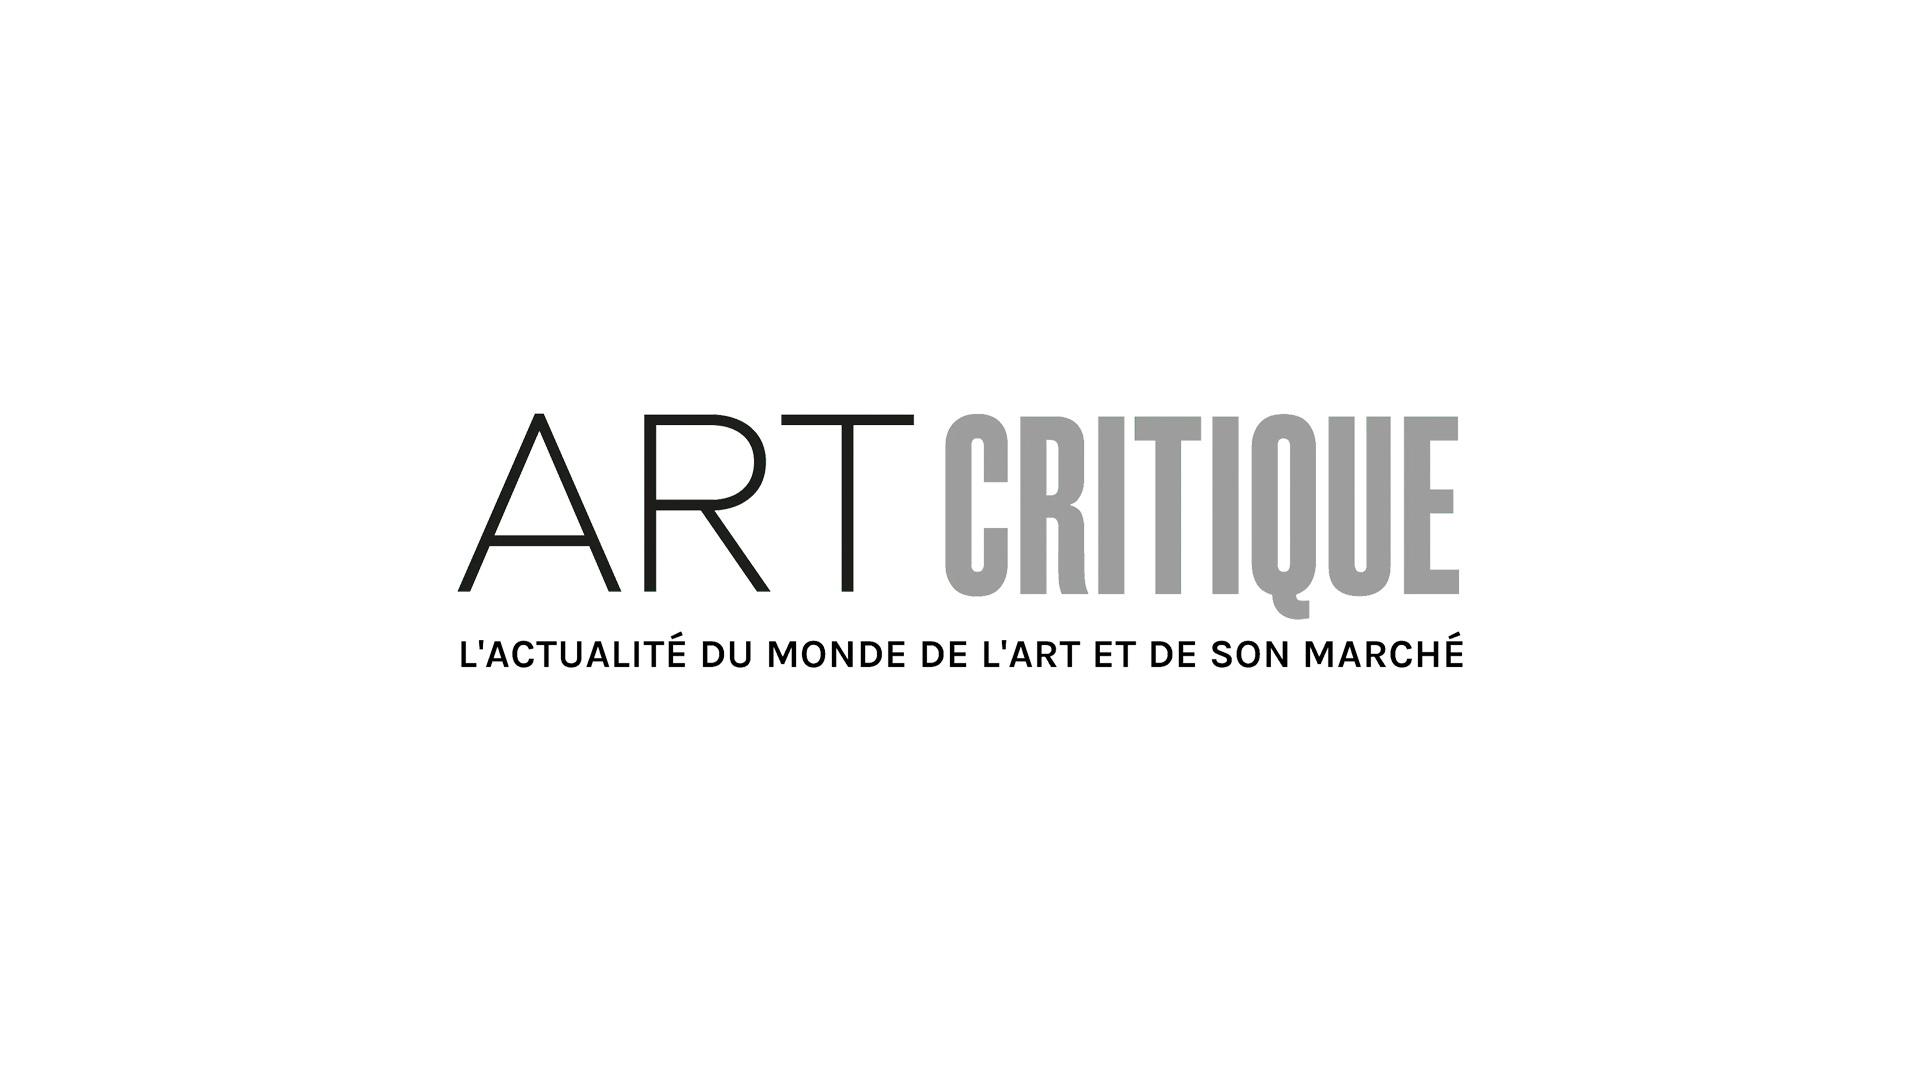 Breaking boundaries of Western art: The work of artist Julio Anaya Cabanding